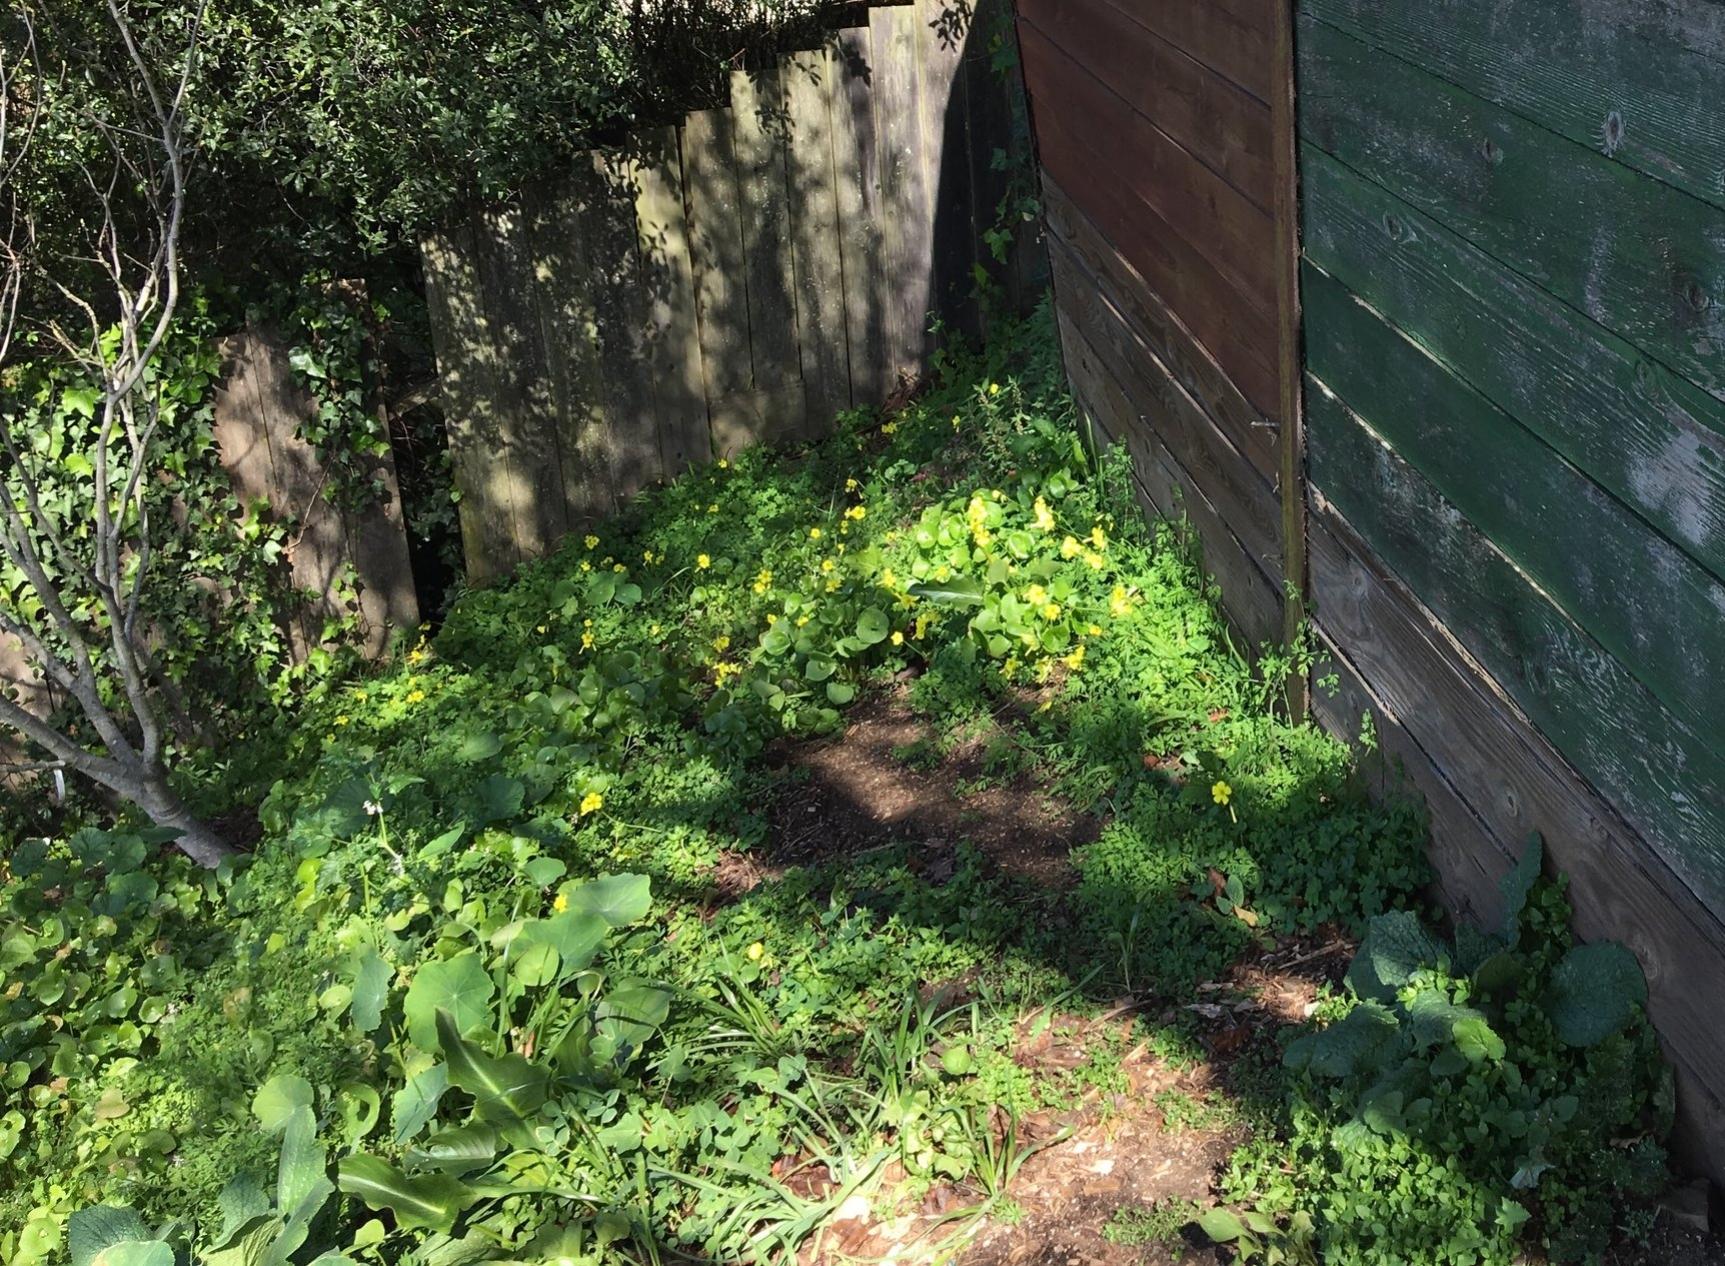 Weeds galore.